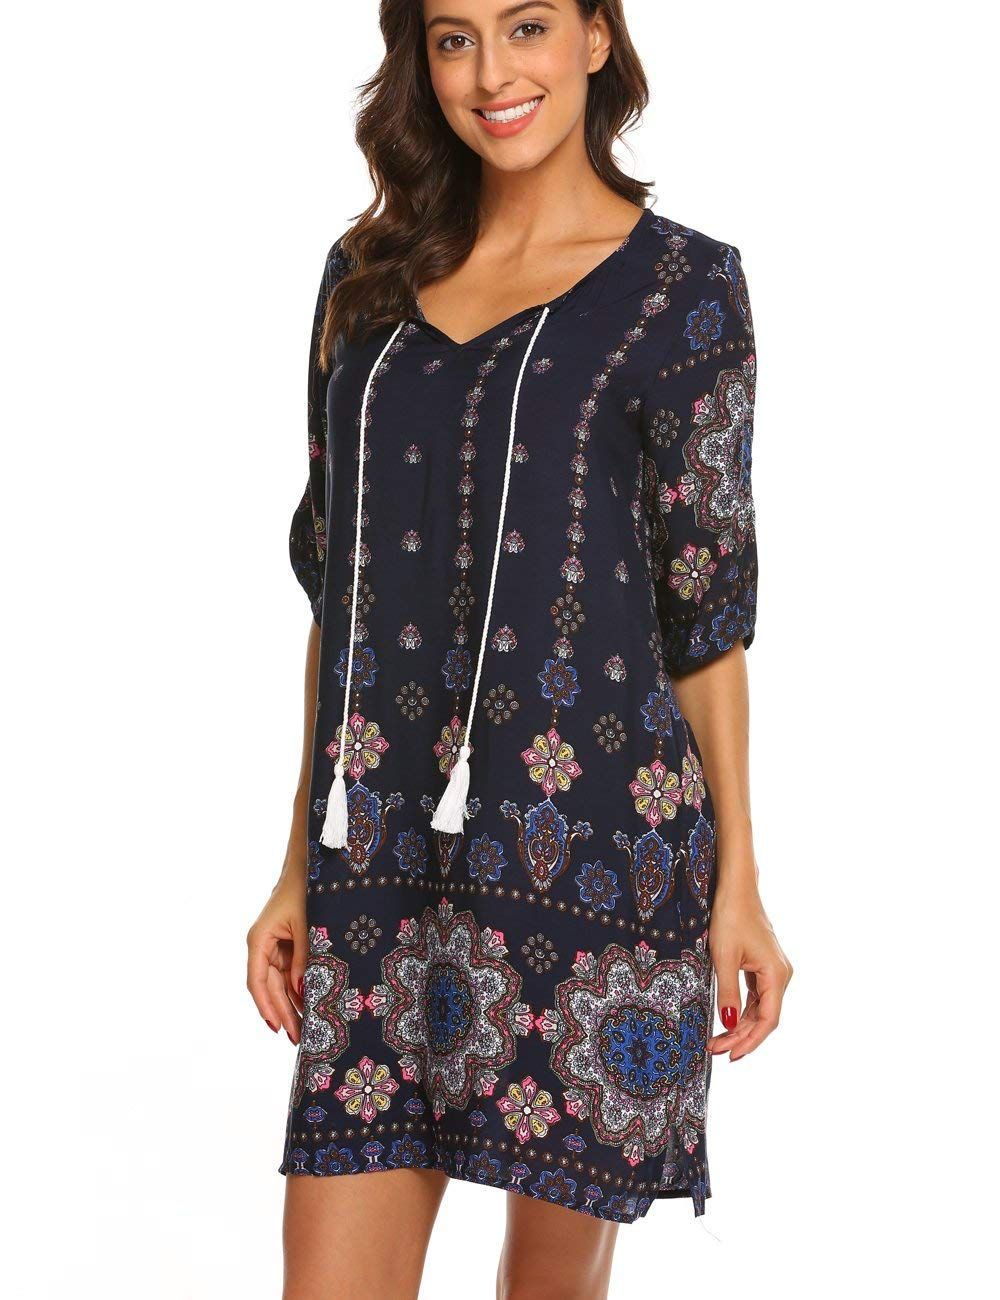 9d1127c4b47a Halife Women's Bohemian Vintage Printed Ethnic Split Casual Tunic Dress  Black, S at Amazon Women's Clothing store: